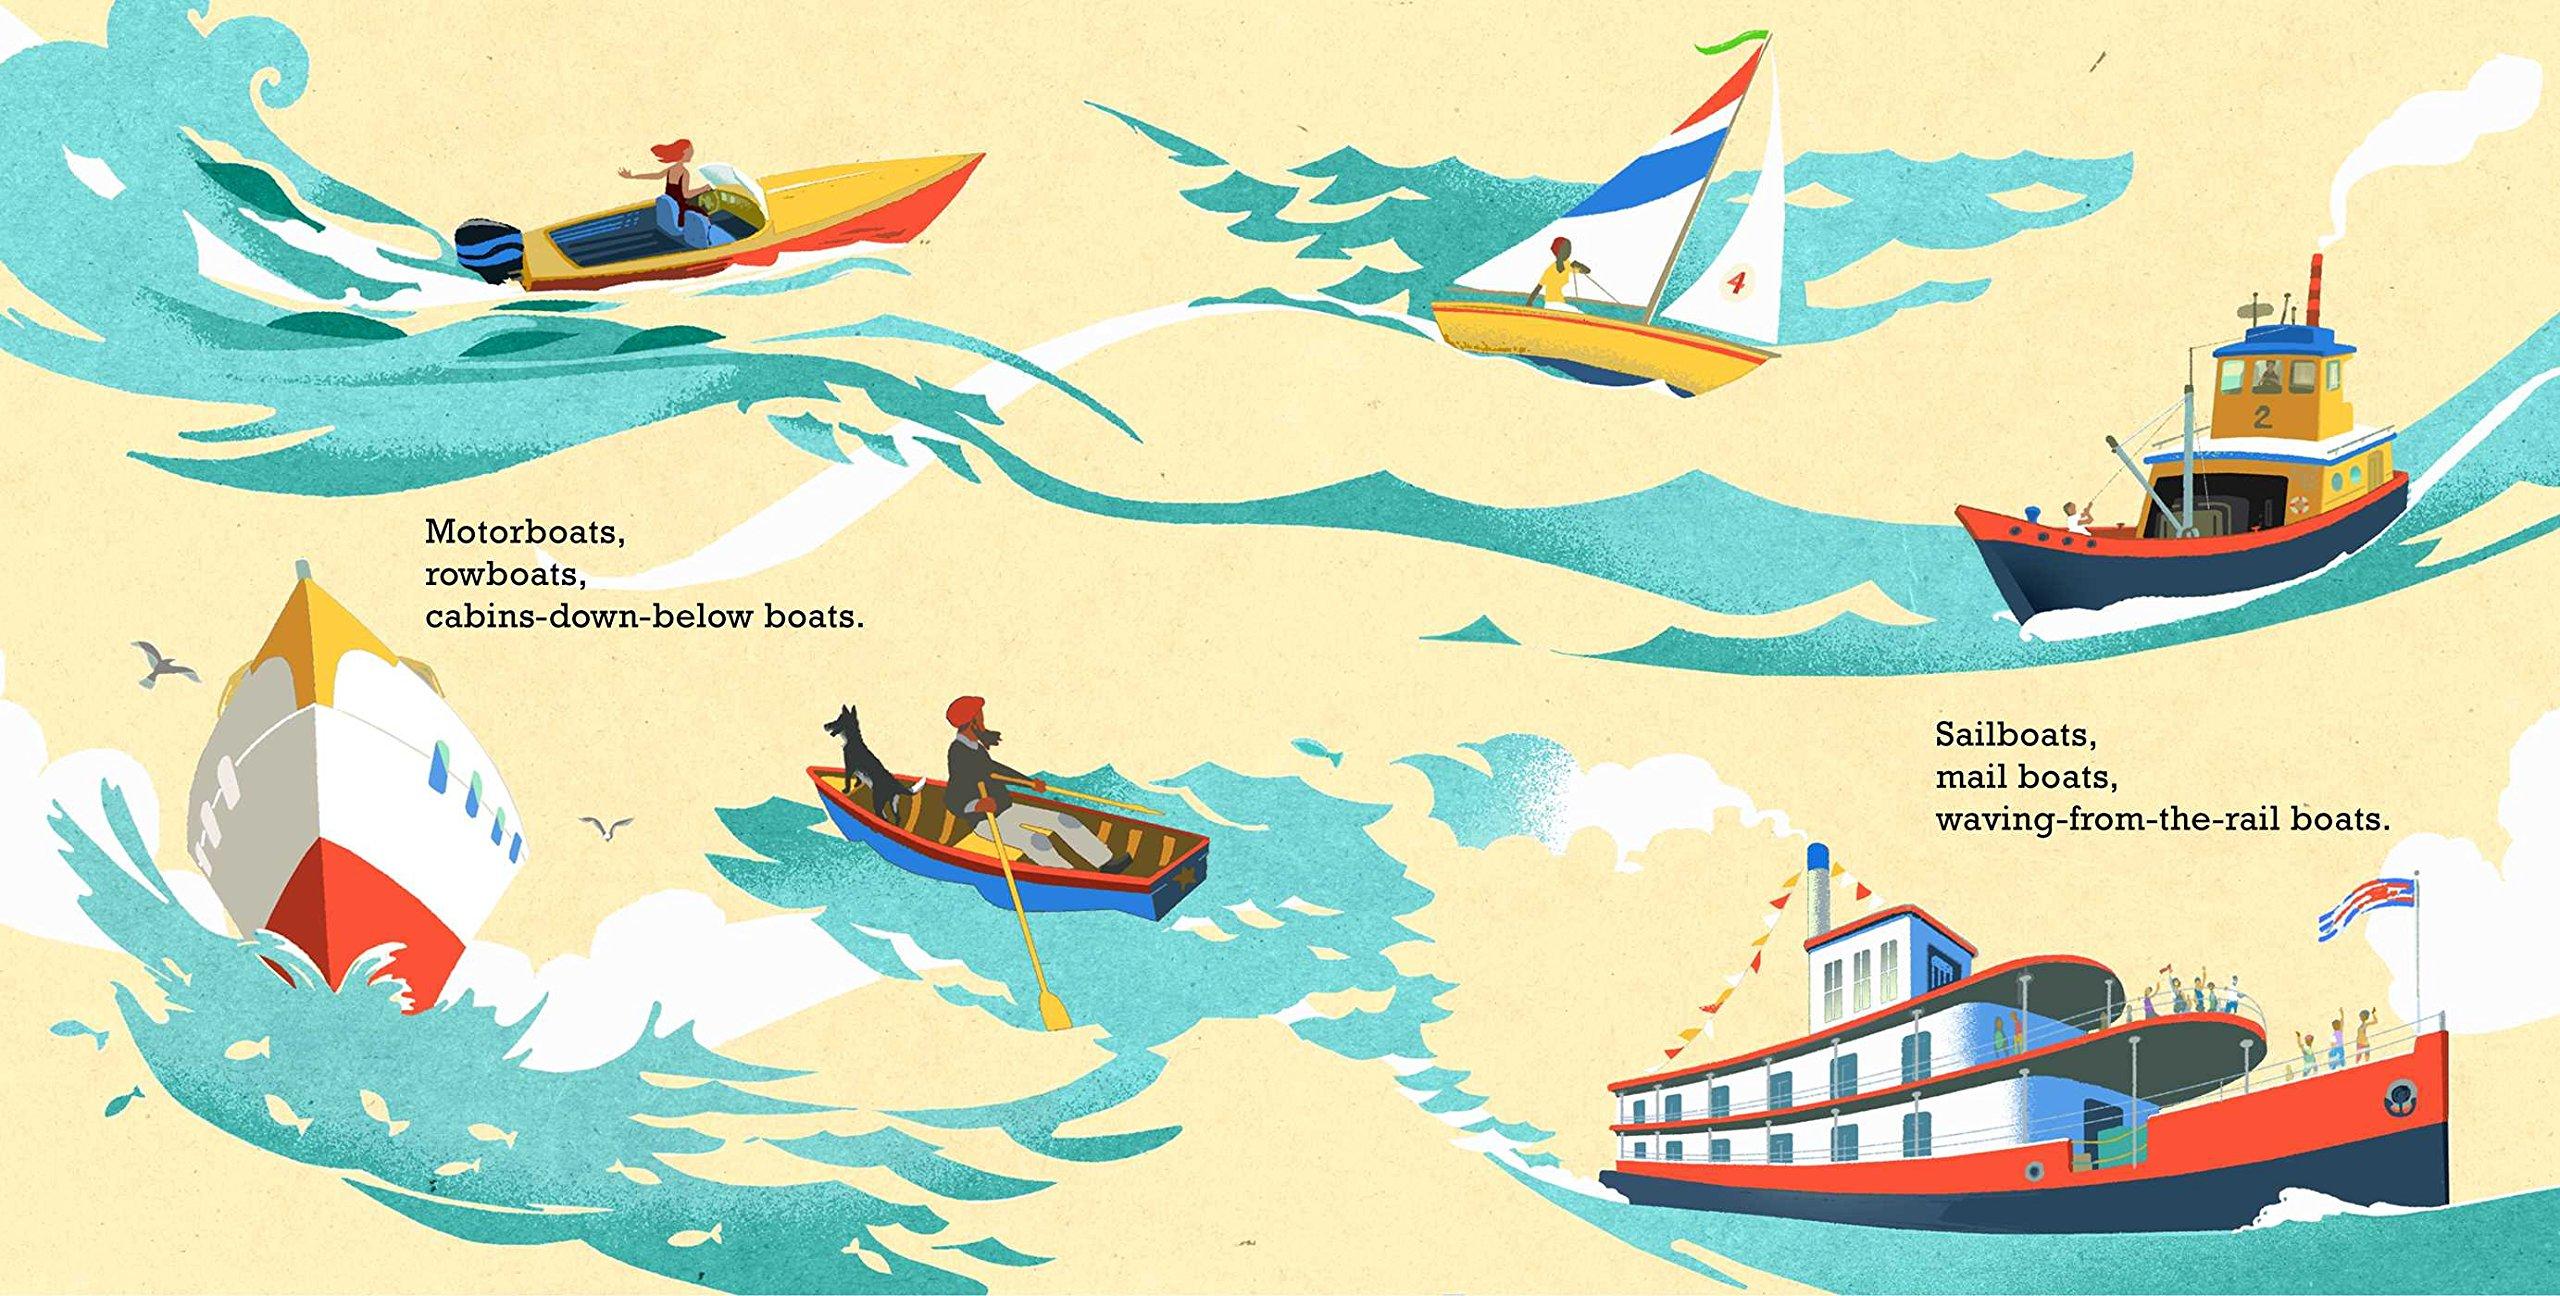 amazon com boats float richard jackson book 9781481403801